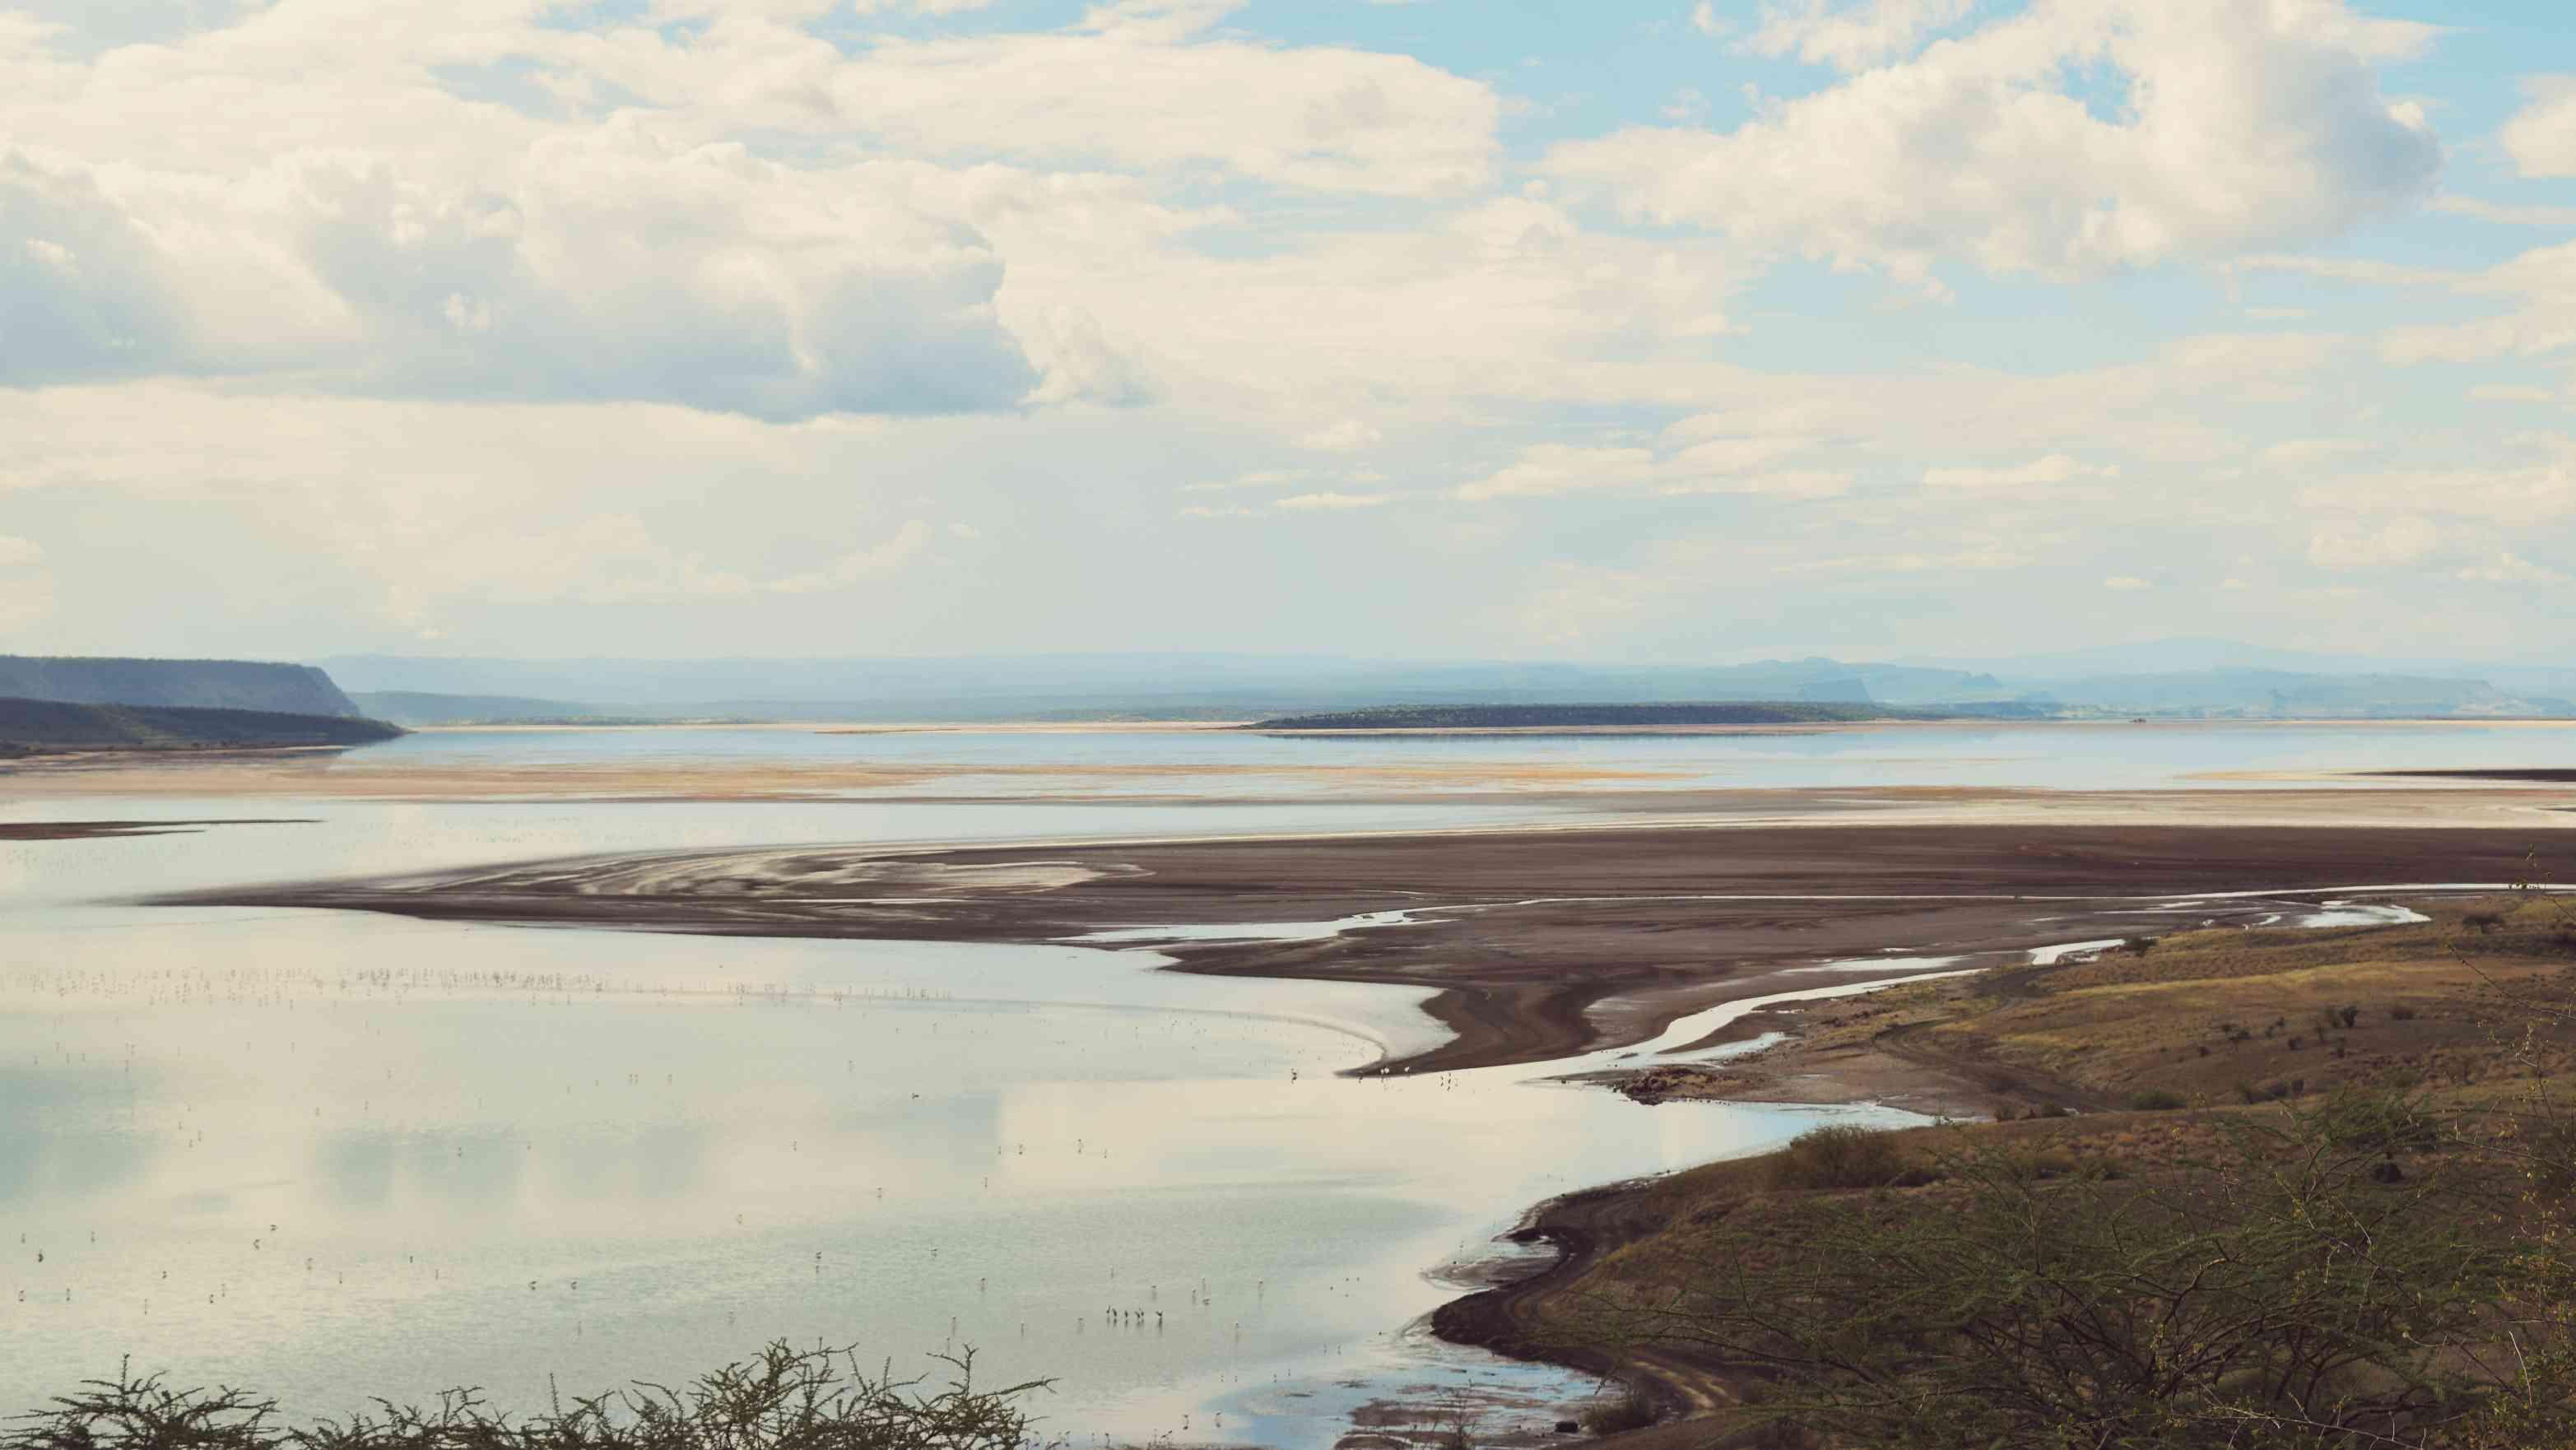 An aerial view of Lake Magadi